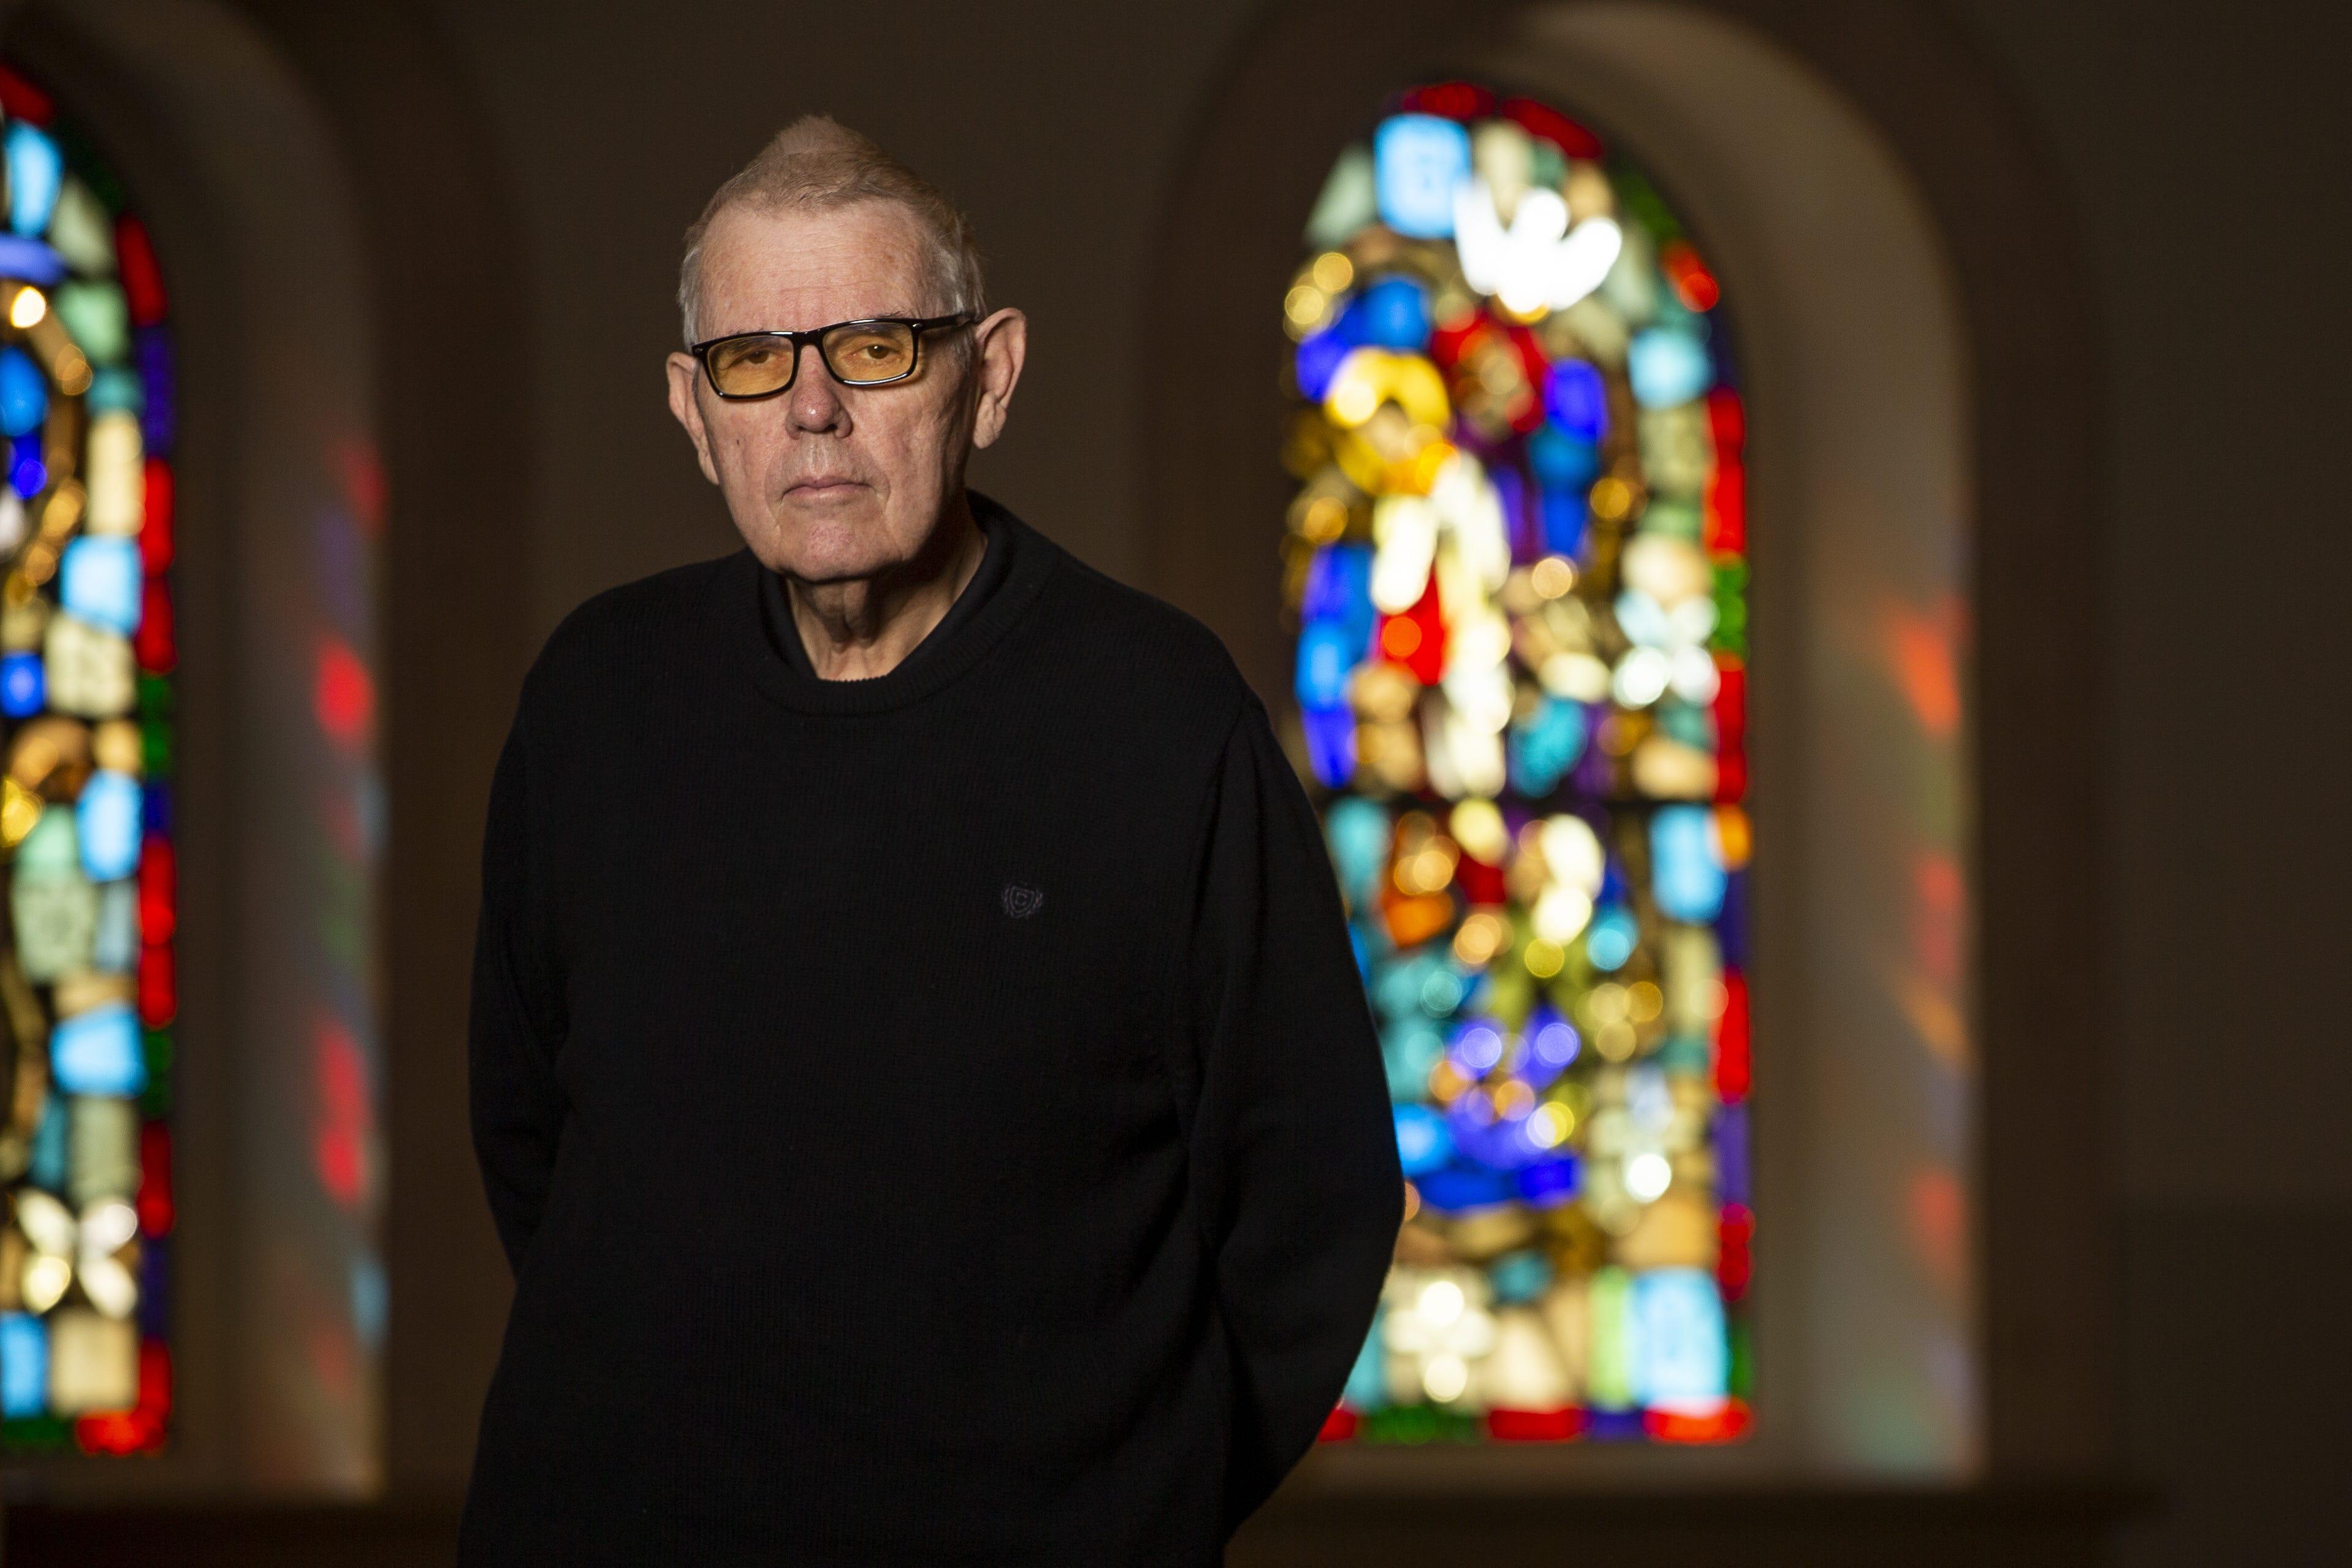 Monsignor John Lyons